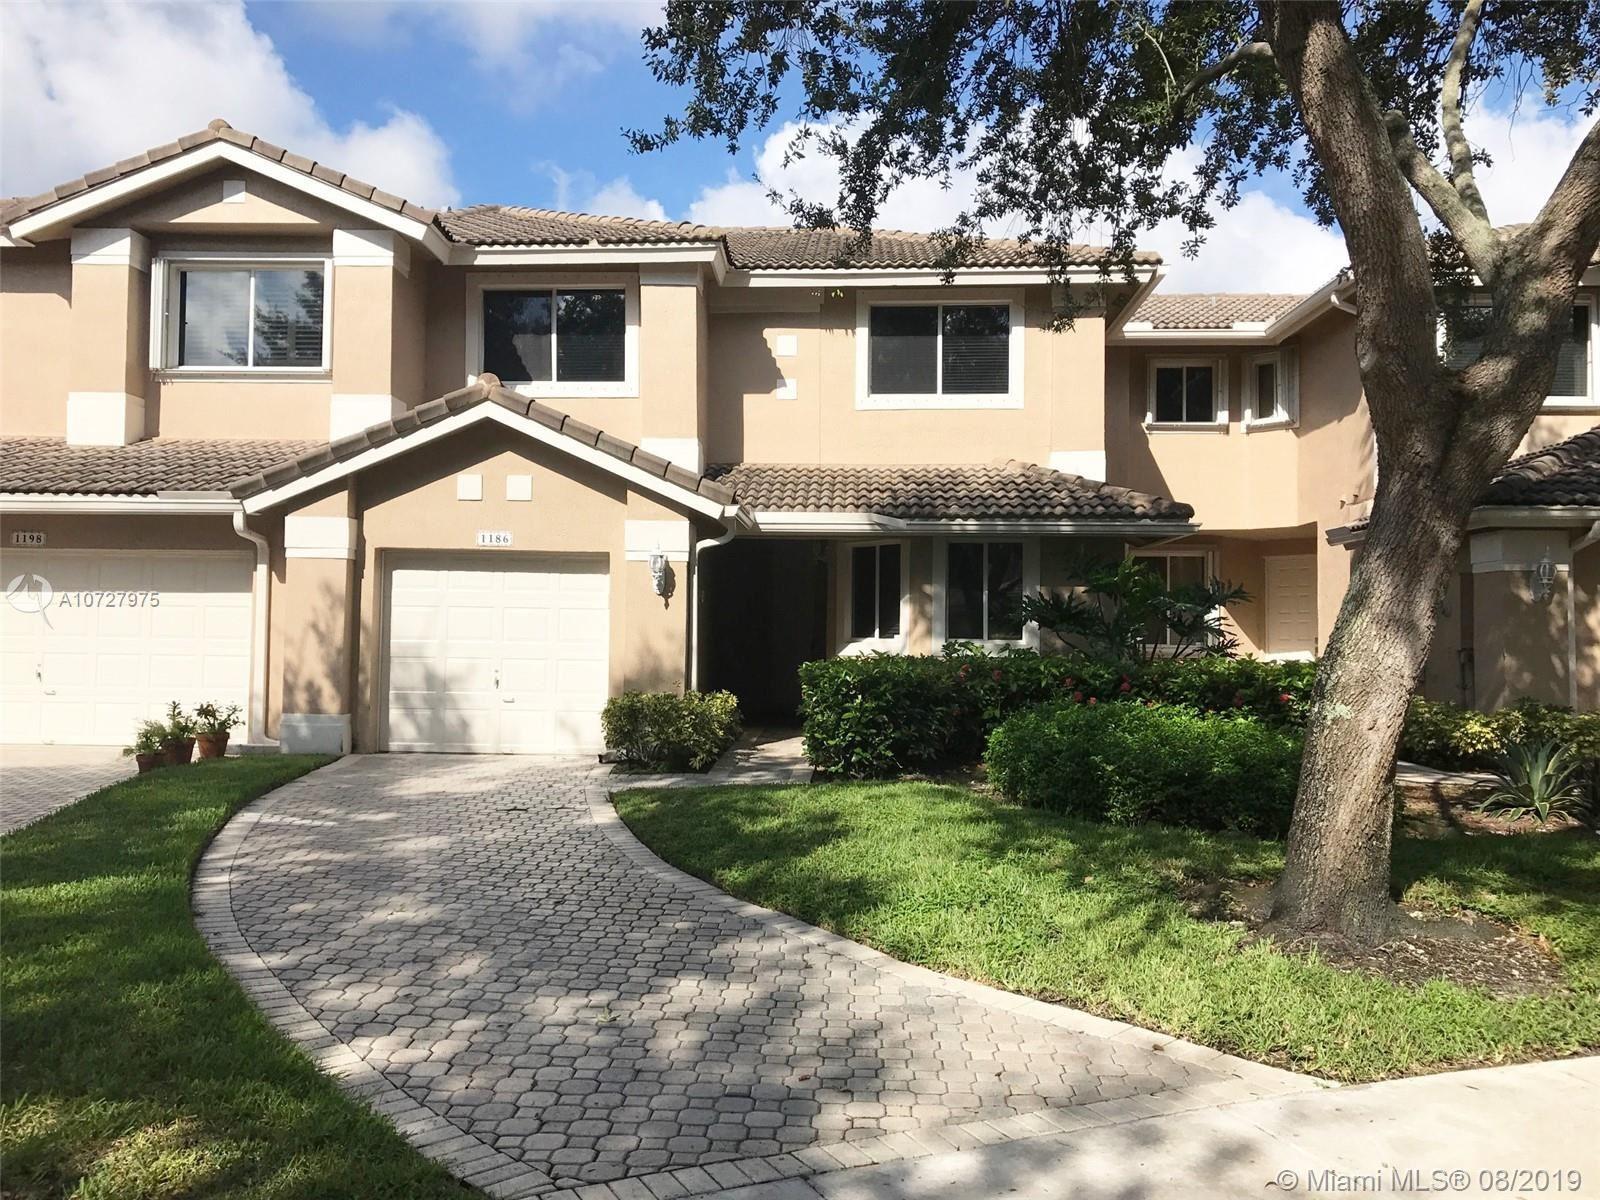 1186 SW 158th Way, Pembroke Pines, FL 33027 - MLS#: A10727975